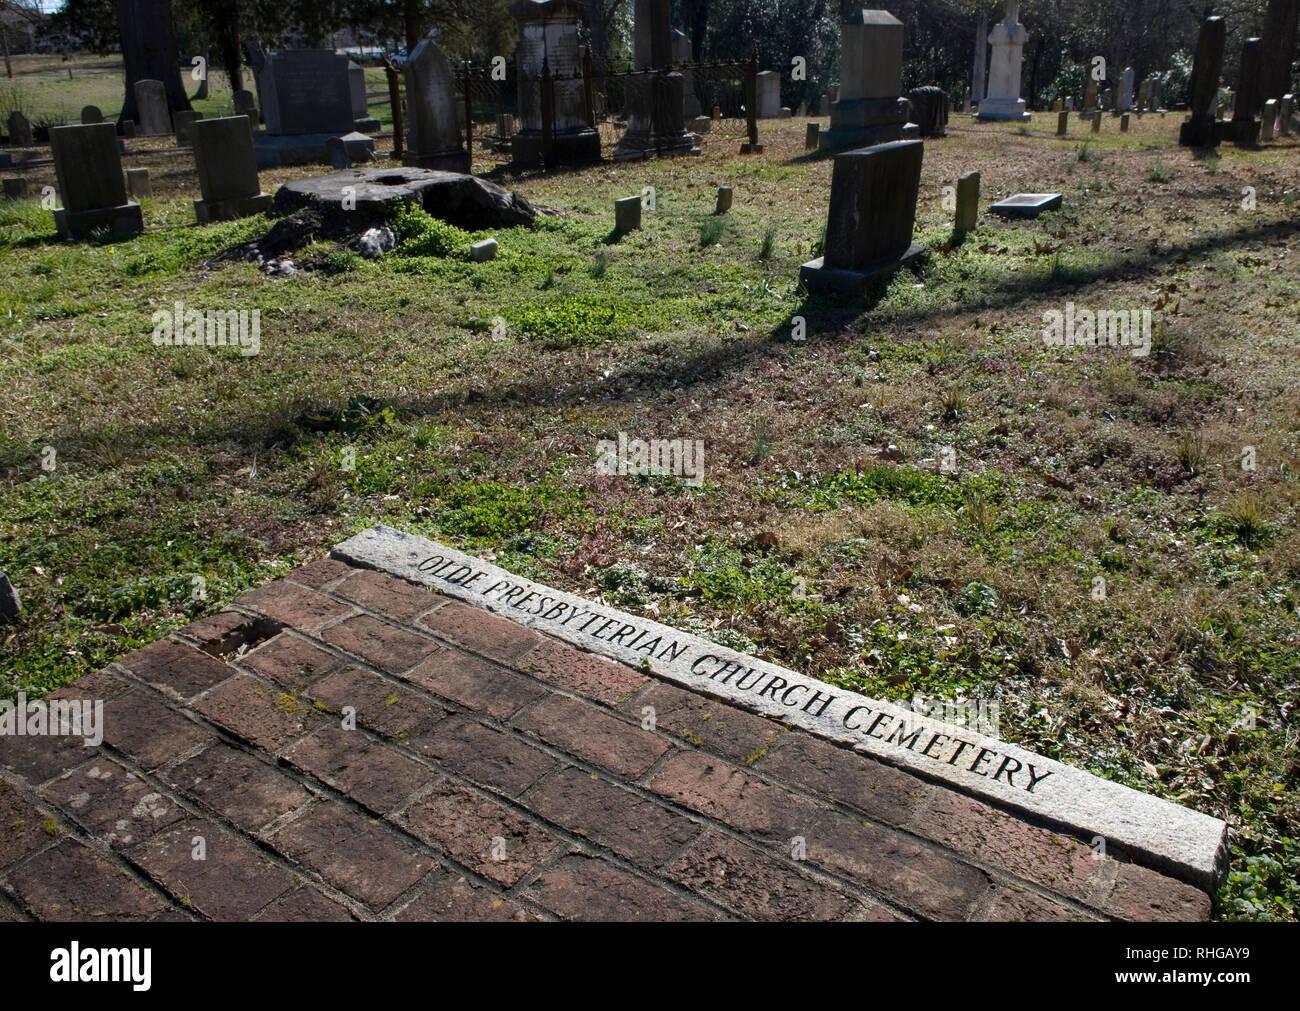 Inscription in stone at Olde Presbyterian Church Cemetery, Lancaster South Carolina USA. - Stock Image